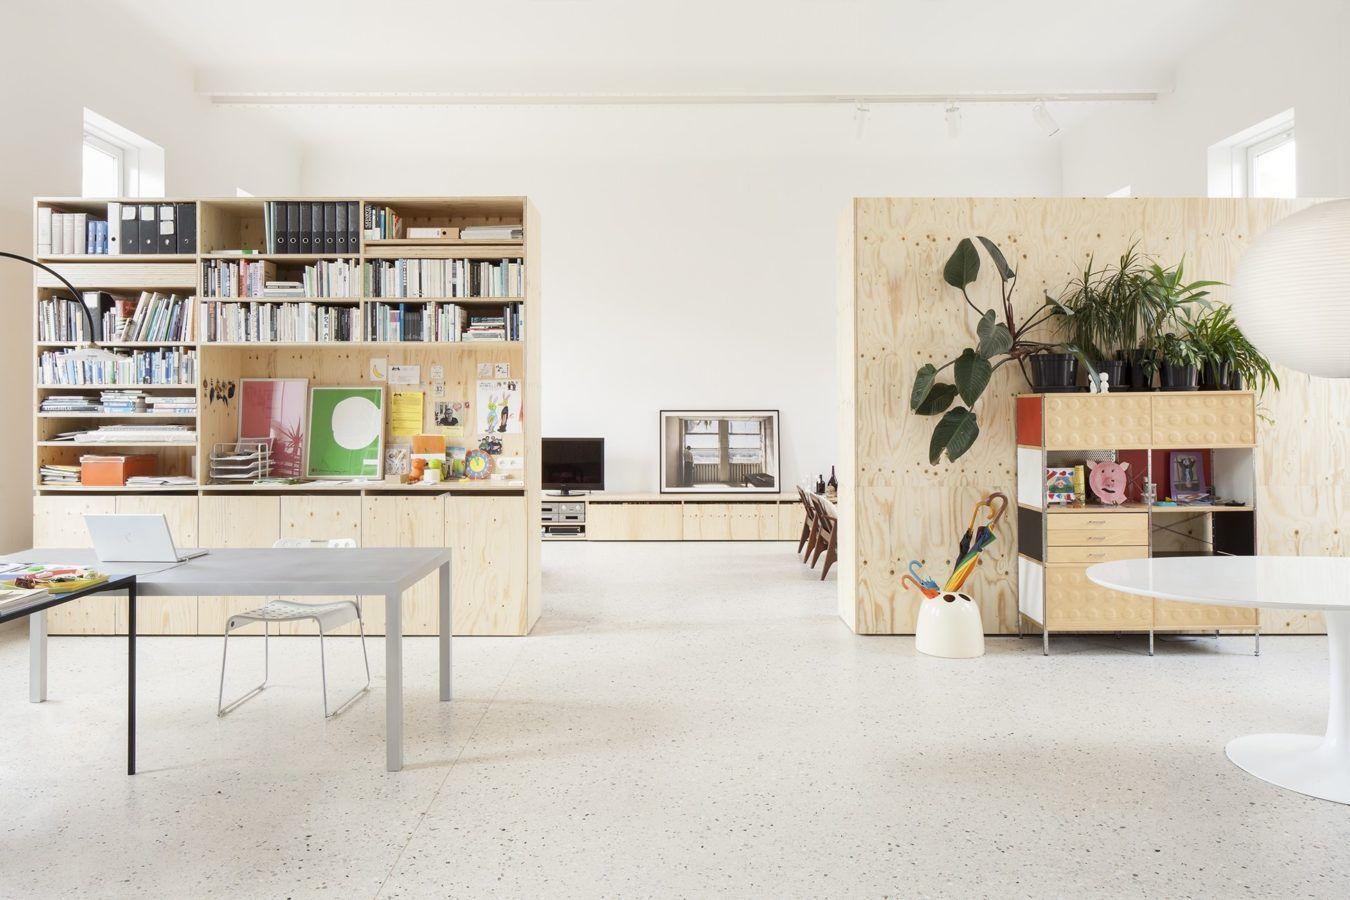 Modern Interieur Herenhuis : Modern herenhuis met multiplex maatwerk kantoor deko